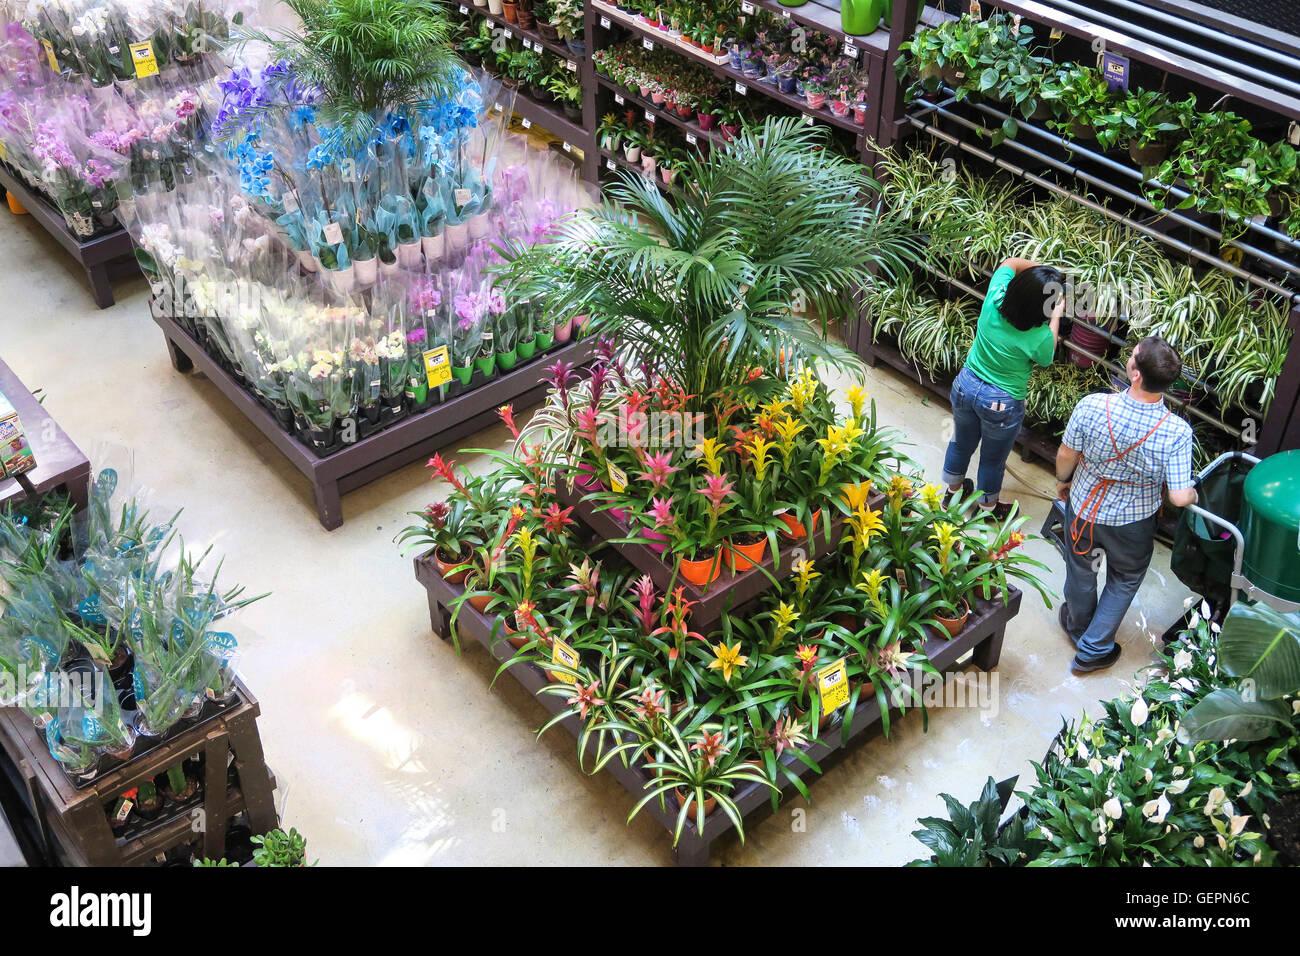 Etonnant Home Depot Store Garden Center Display, NYC